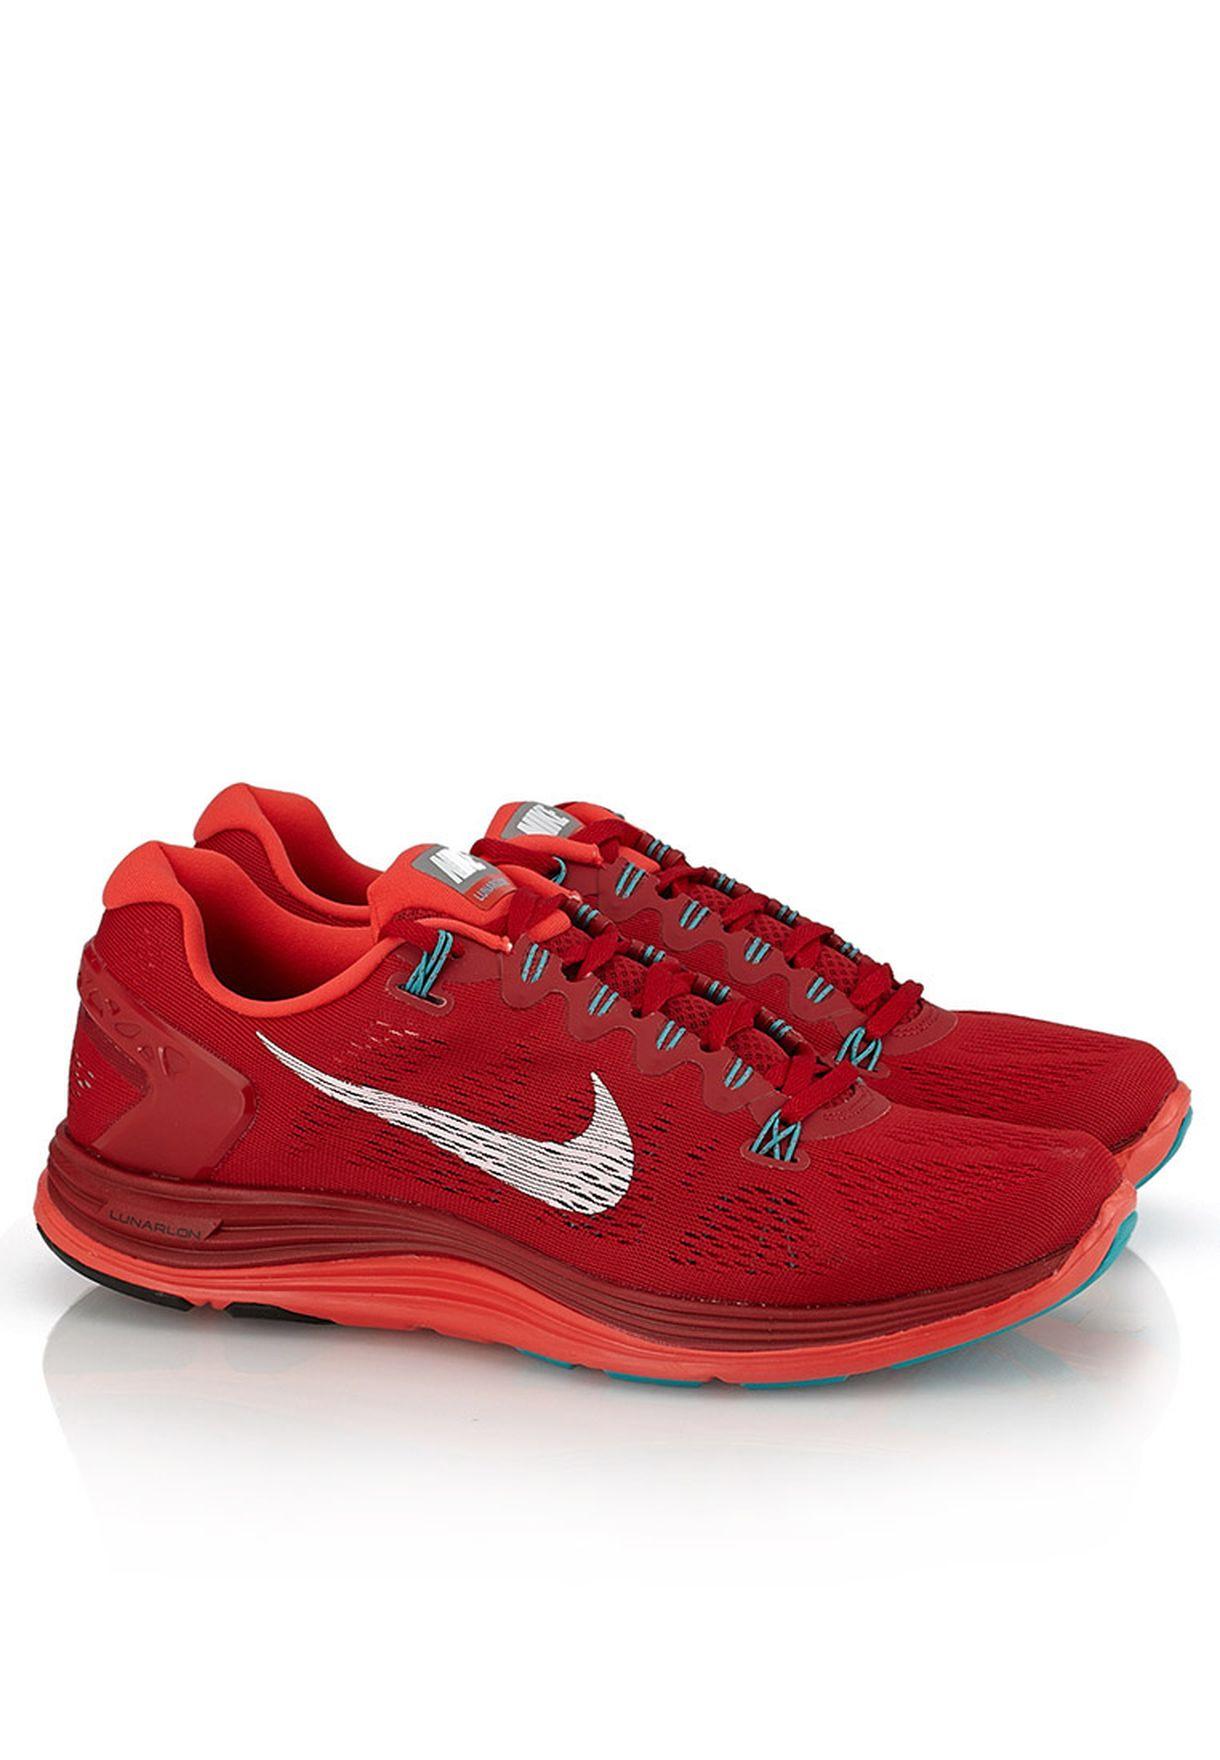 pretty nice 9d17b 00797 Nike Lunarglide 5